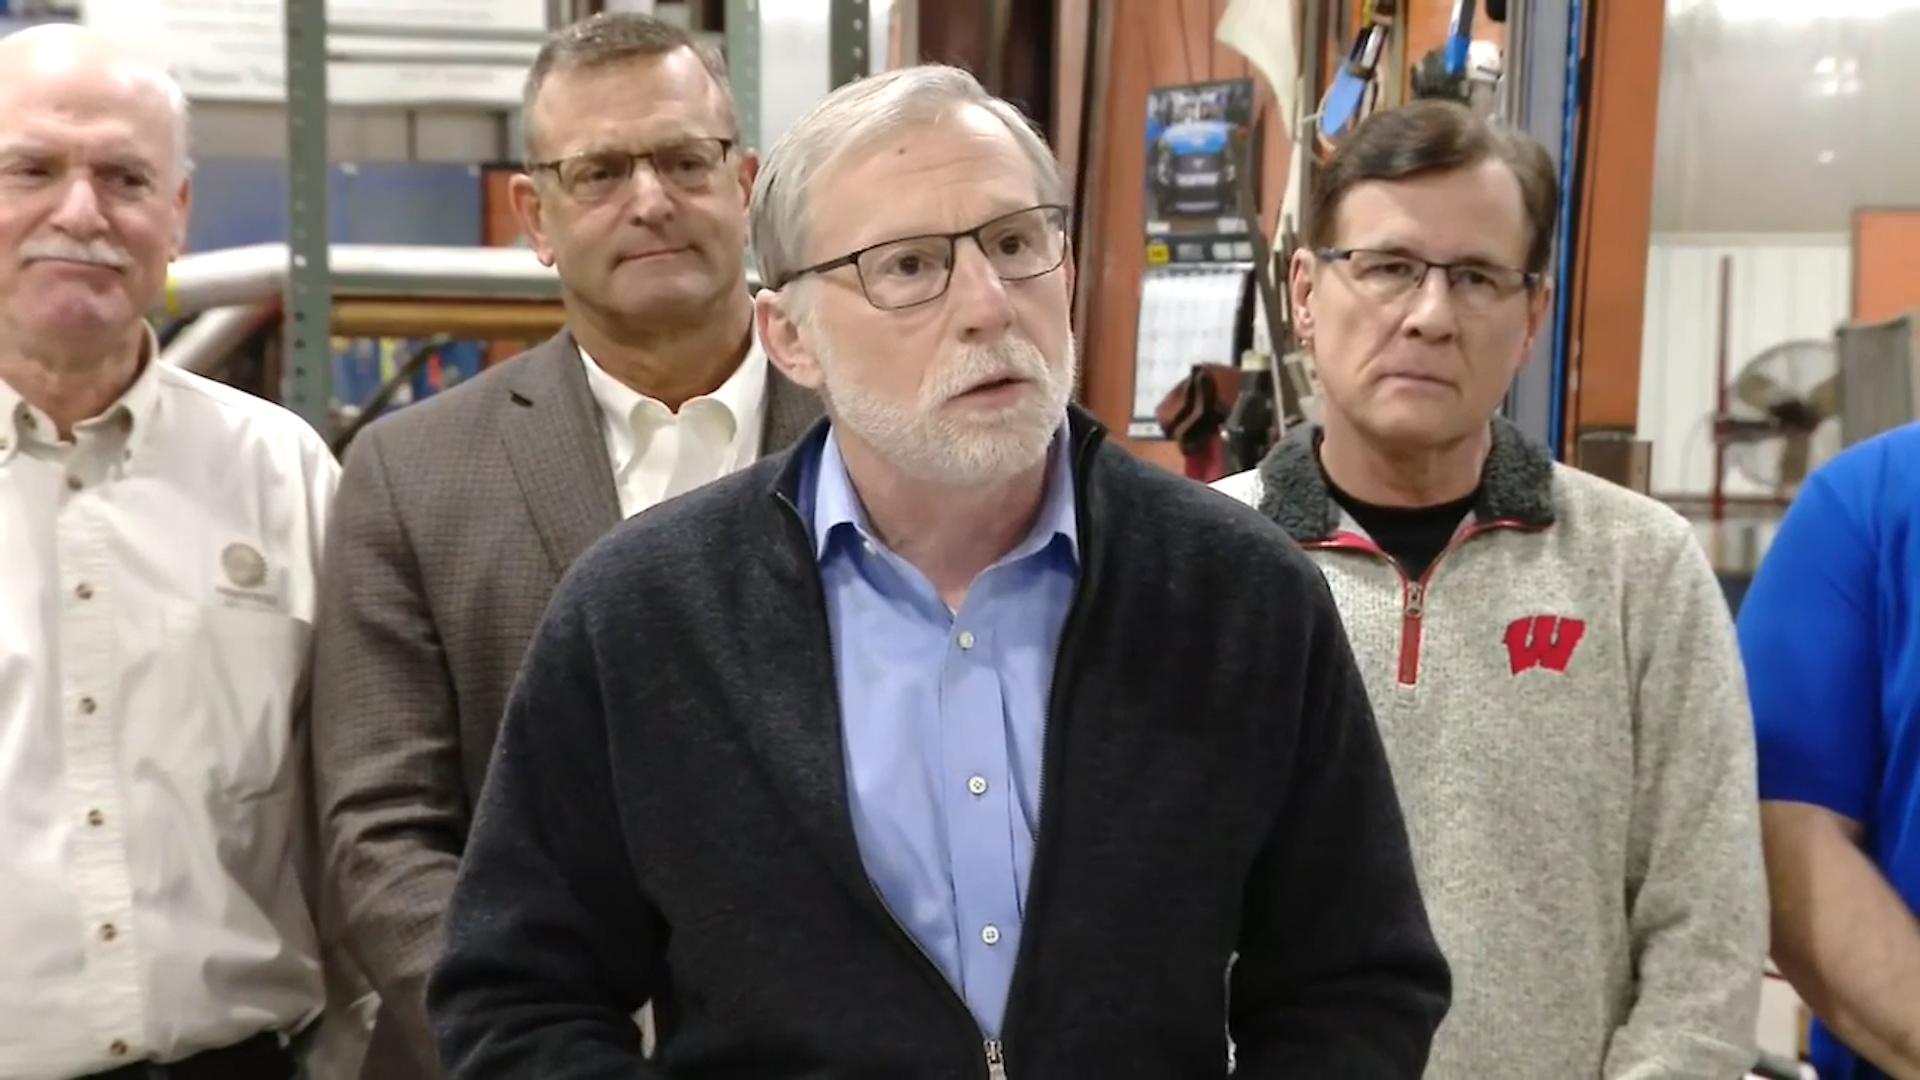 Rep. Mike Rohrkaste announces a GOP tax plan in Kaukauna